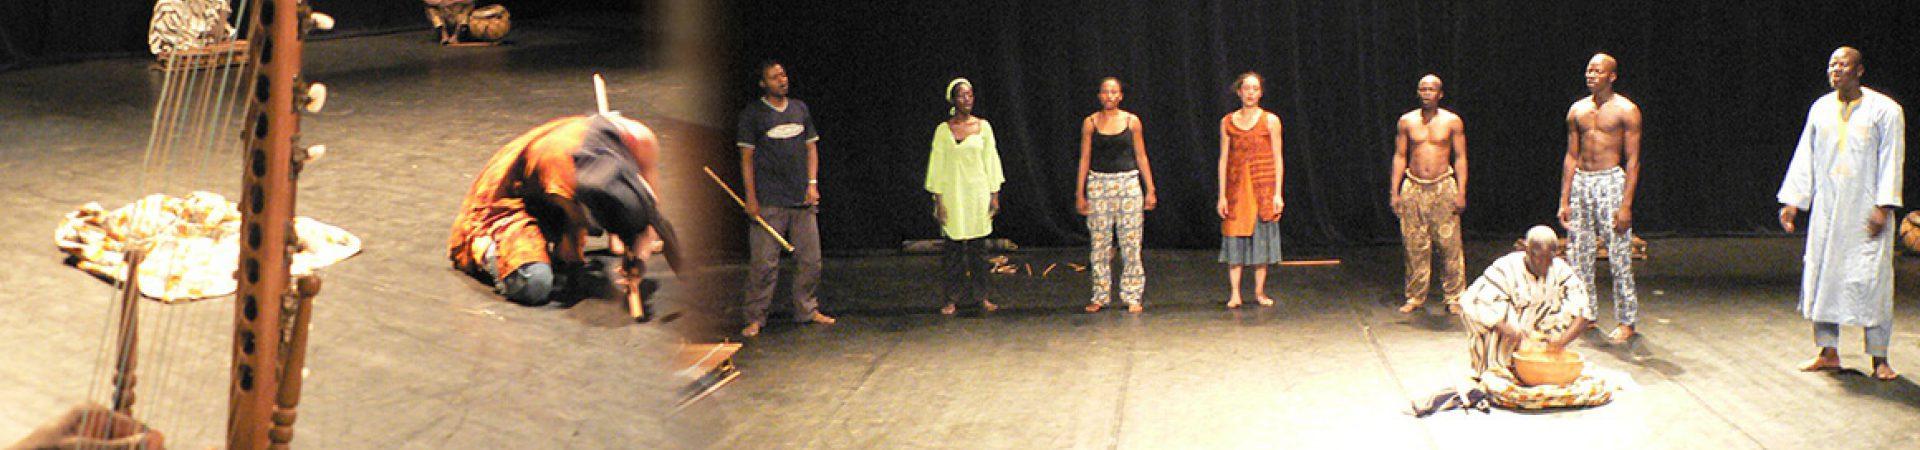 Koom Kalao - Création 2008 (Ouagadougou)